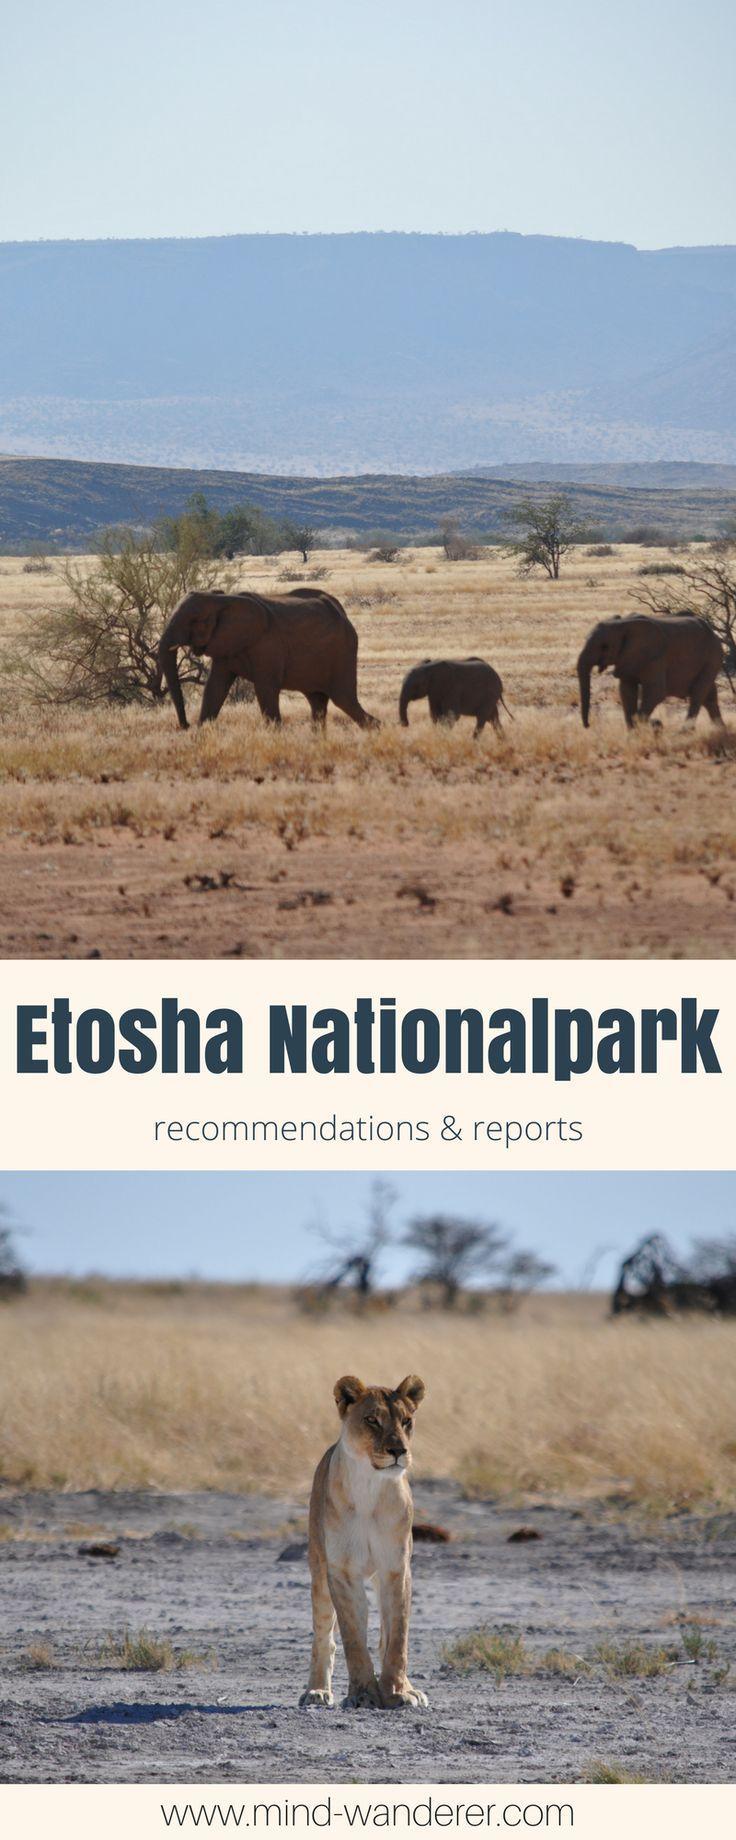 Auf Safari im Etosha Nationalpark   AFRIKA   AFRICA   Reisen